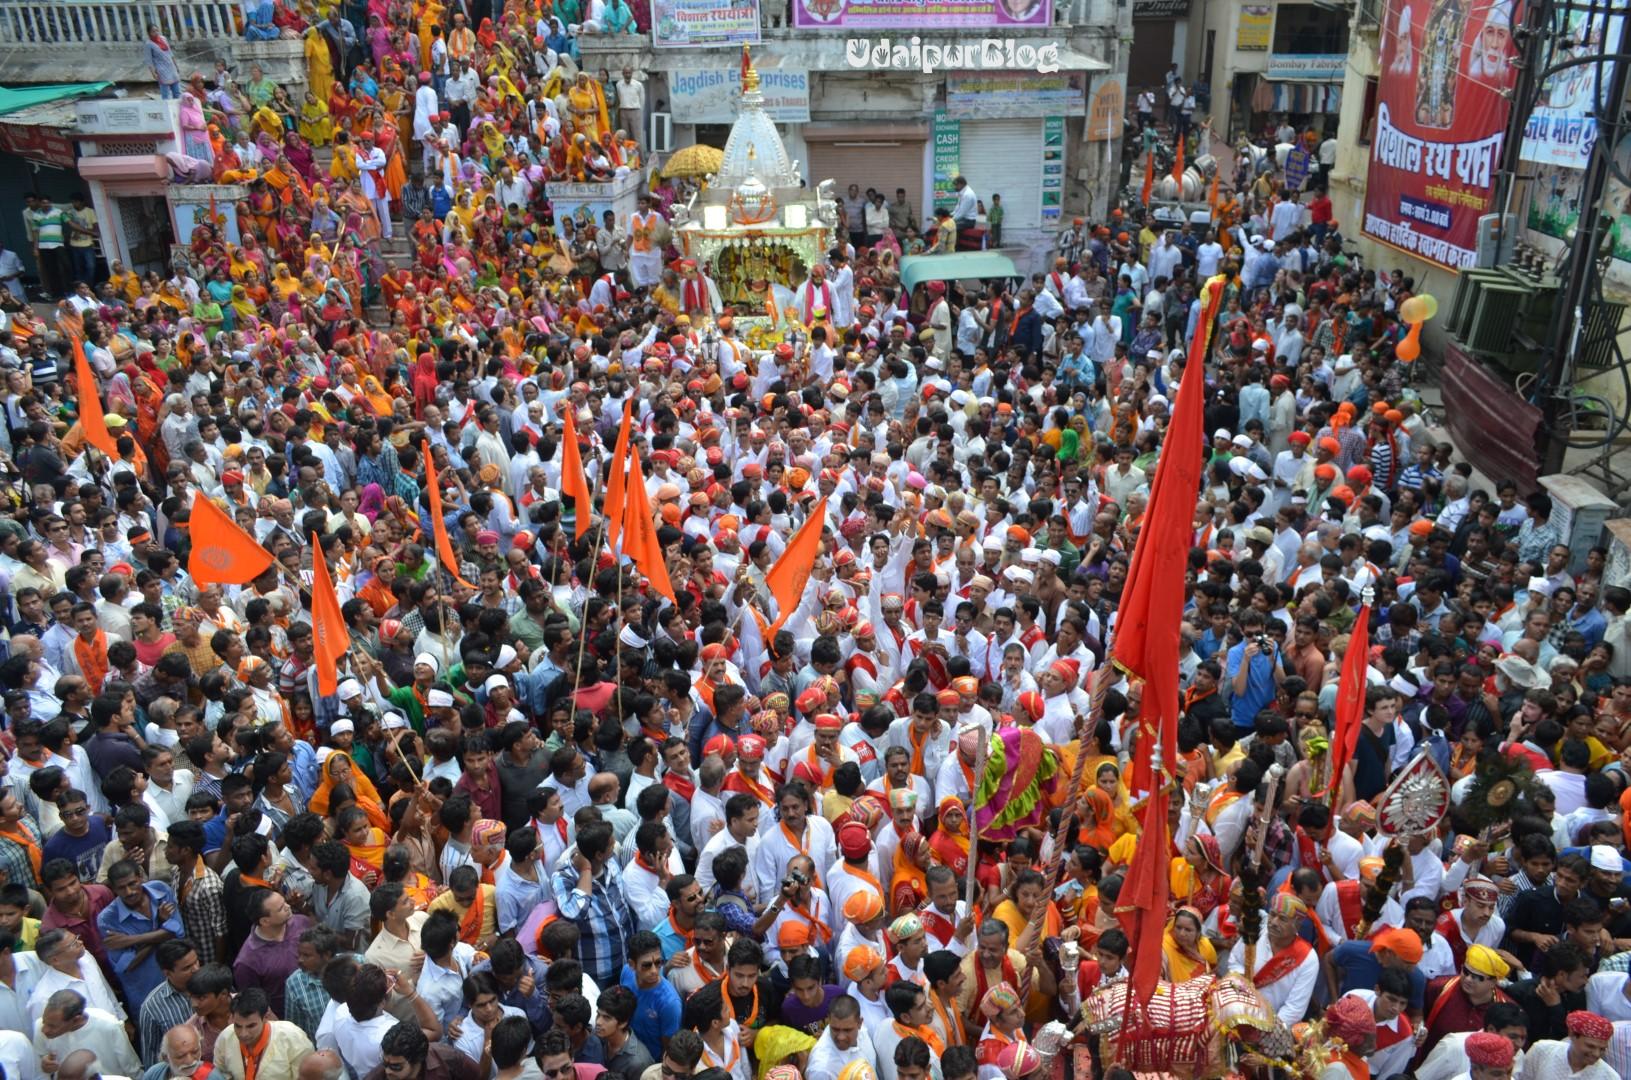 Jagdish Chowk - Jagannath Rath Yatra Udaipur